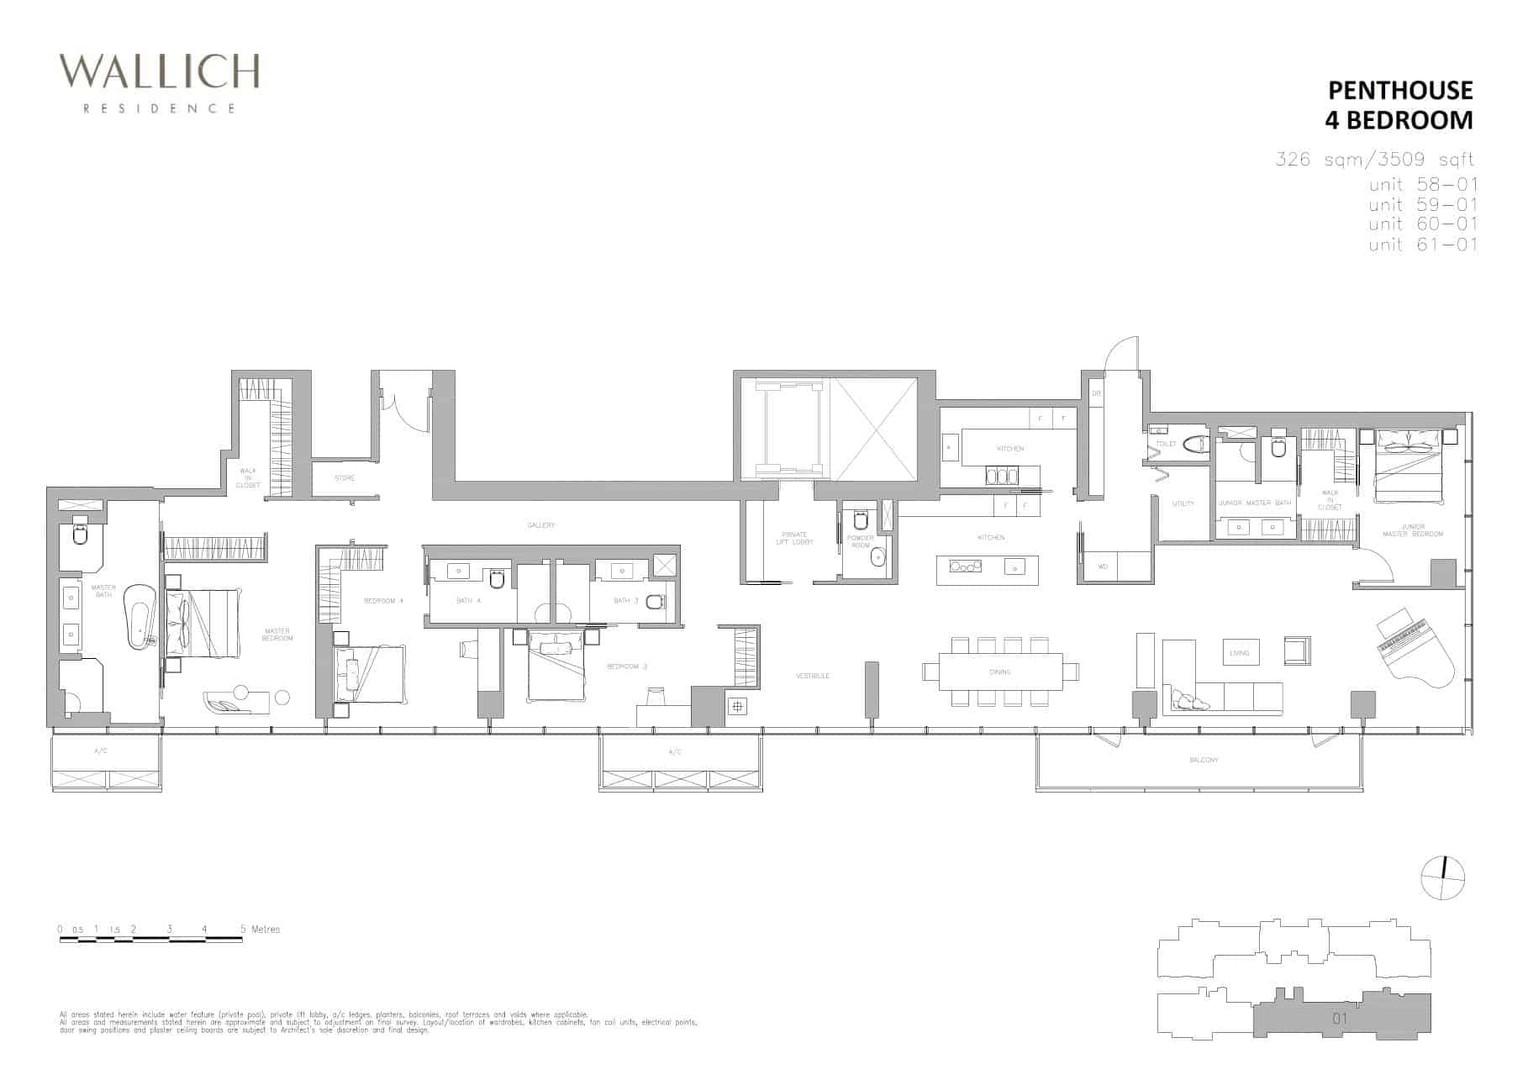 Wallich Residence Type PH